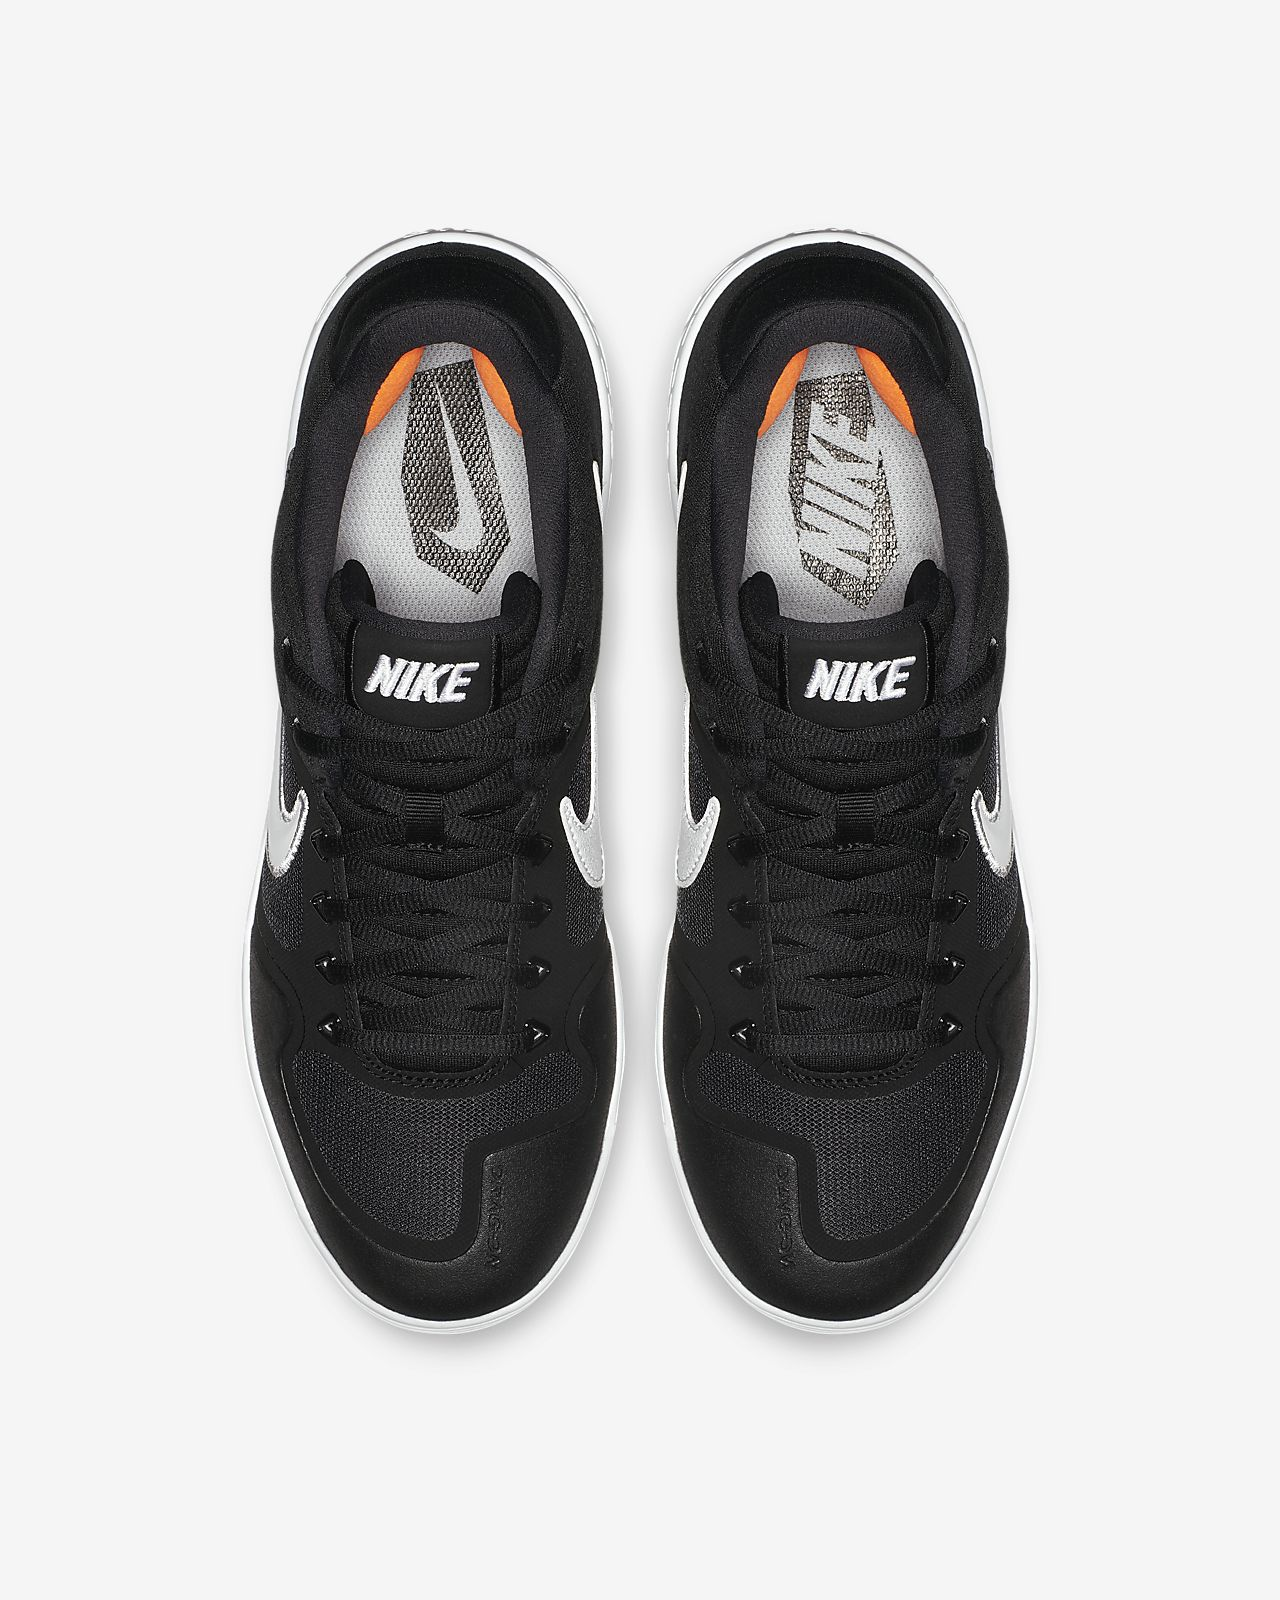 b45576efda5d1 Nike Alpha Huarache Elite 2 Low MCS Men s Baseball Cleat. Nike.com